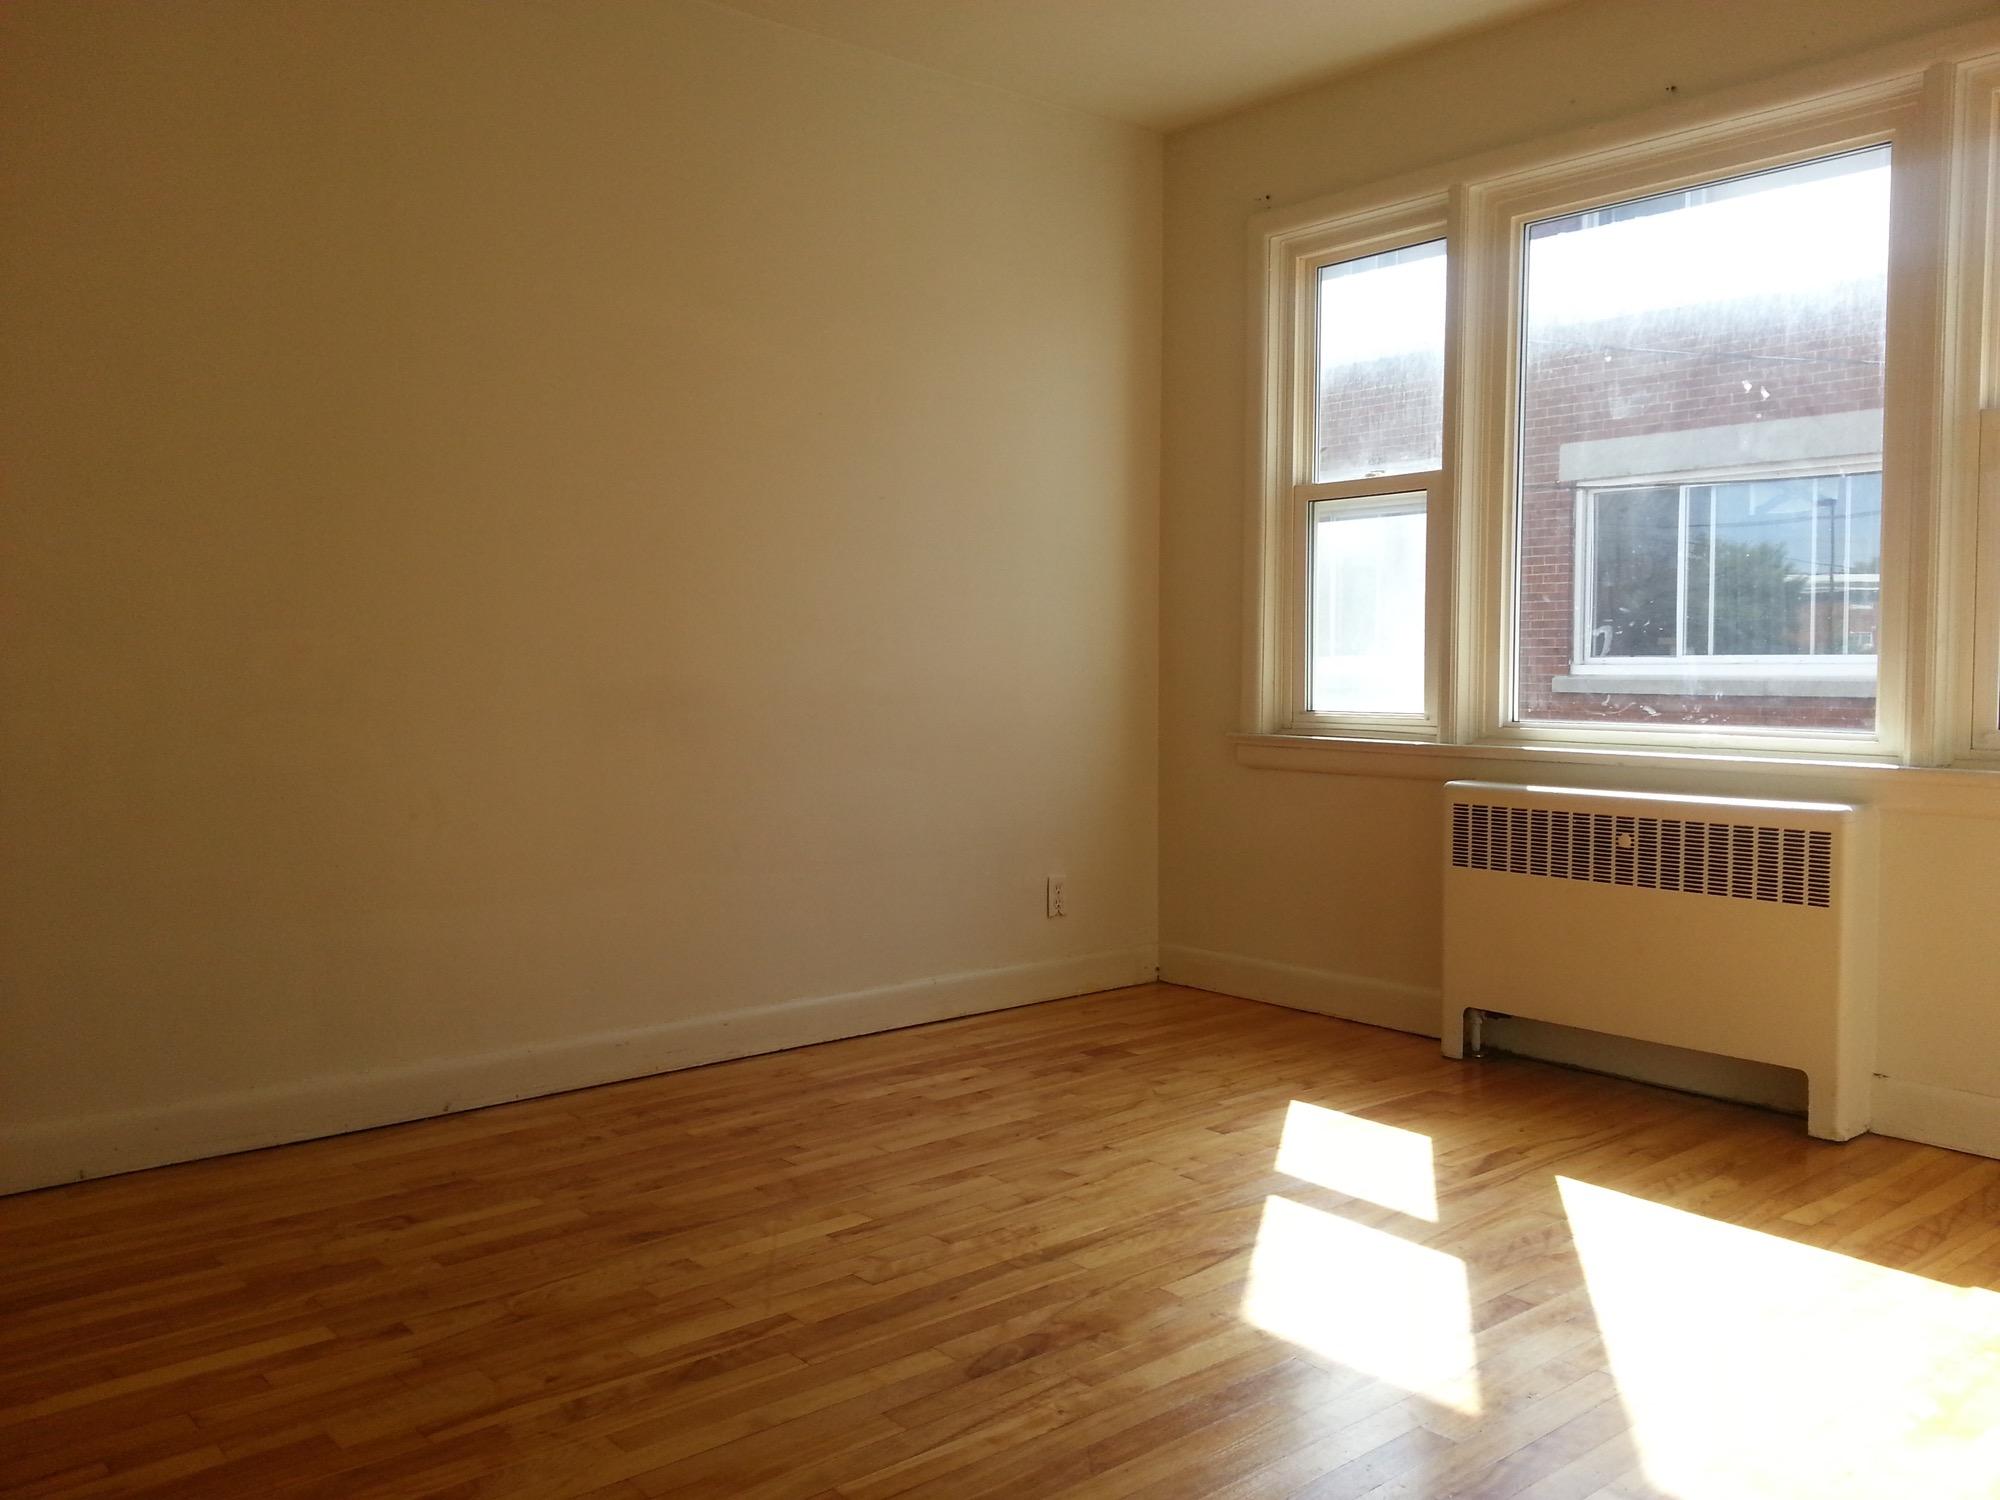 Ottawa Apartment Building for Sale in Vanier - 387 Carmen ...